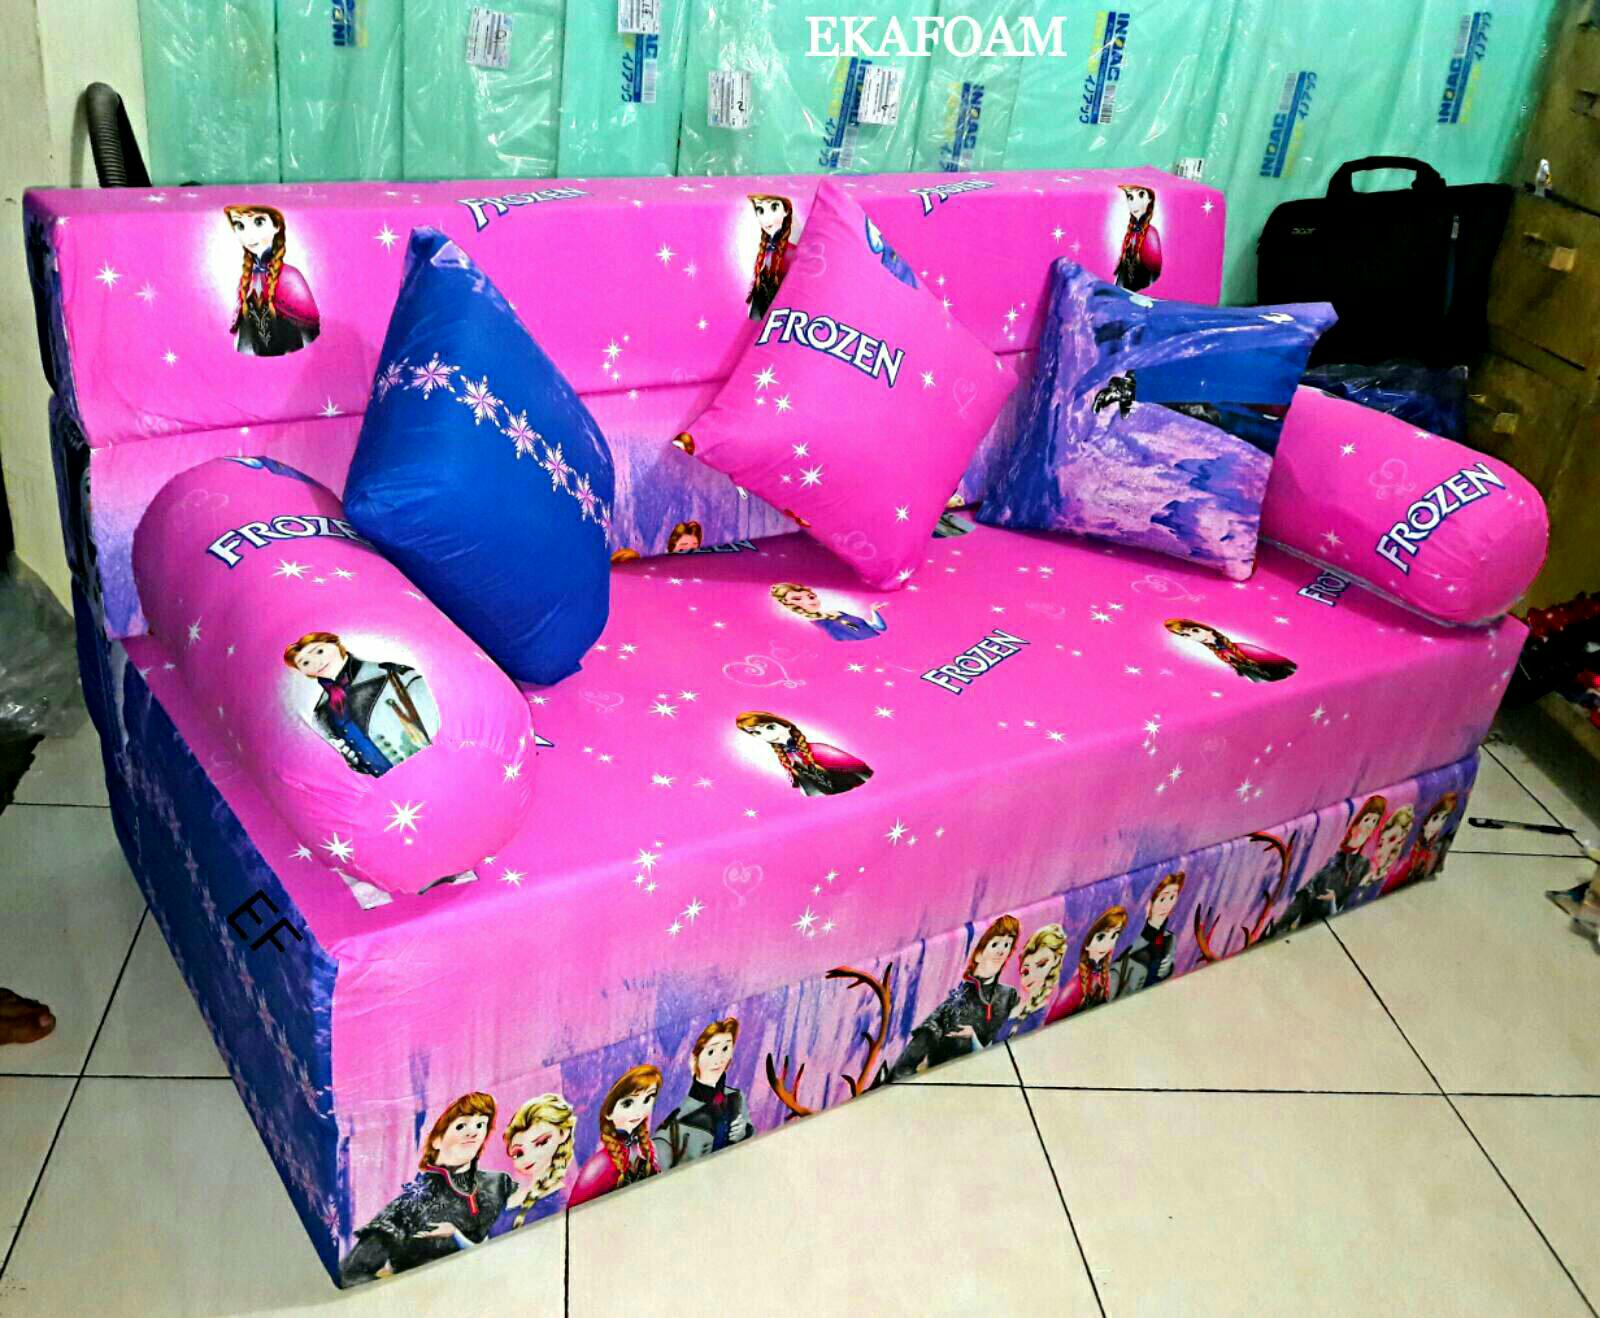 Sofa Bed Inoac 3 In 1 Norwalk Stowe 2018 Full Motif Agen Resmi Kasur Busa